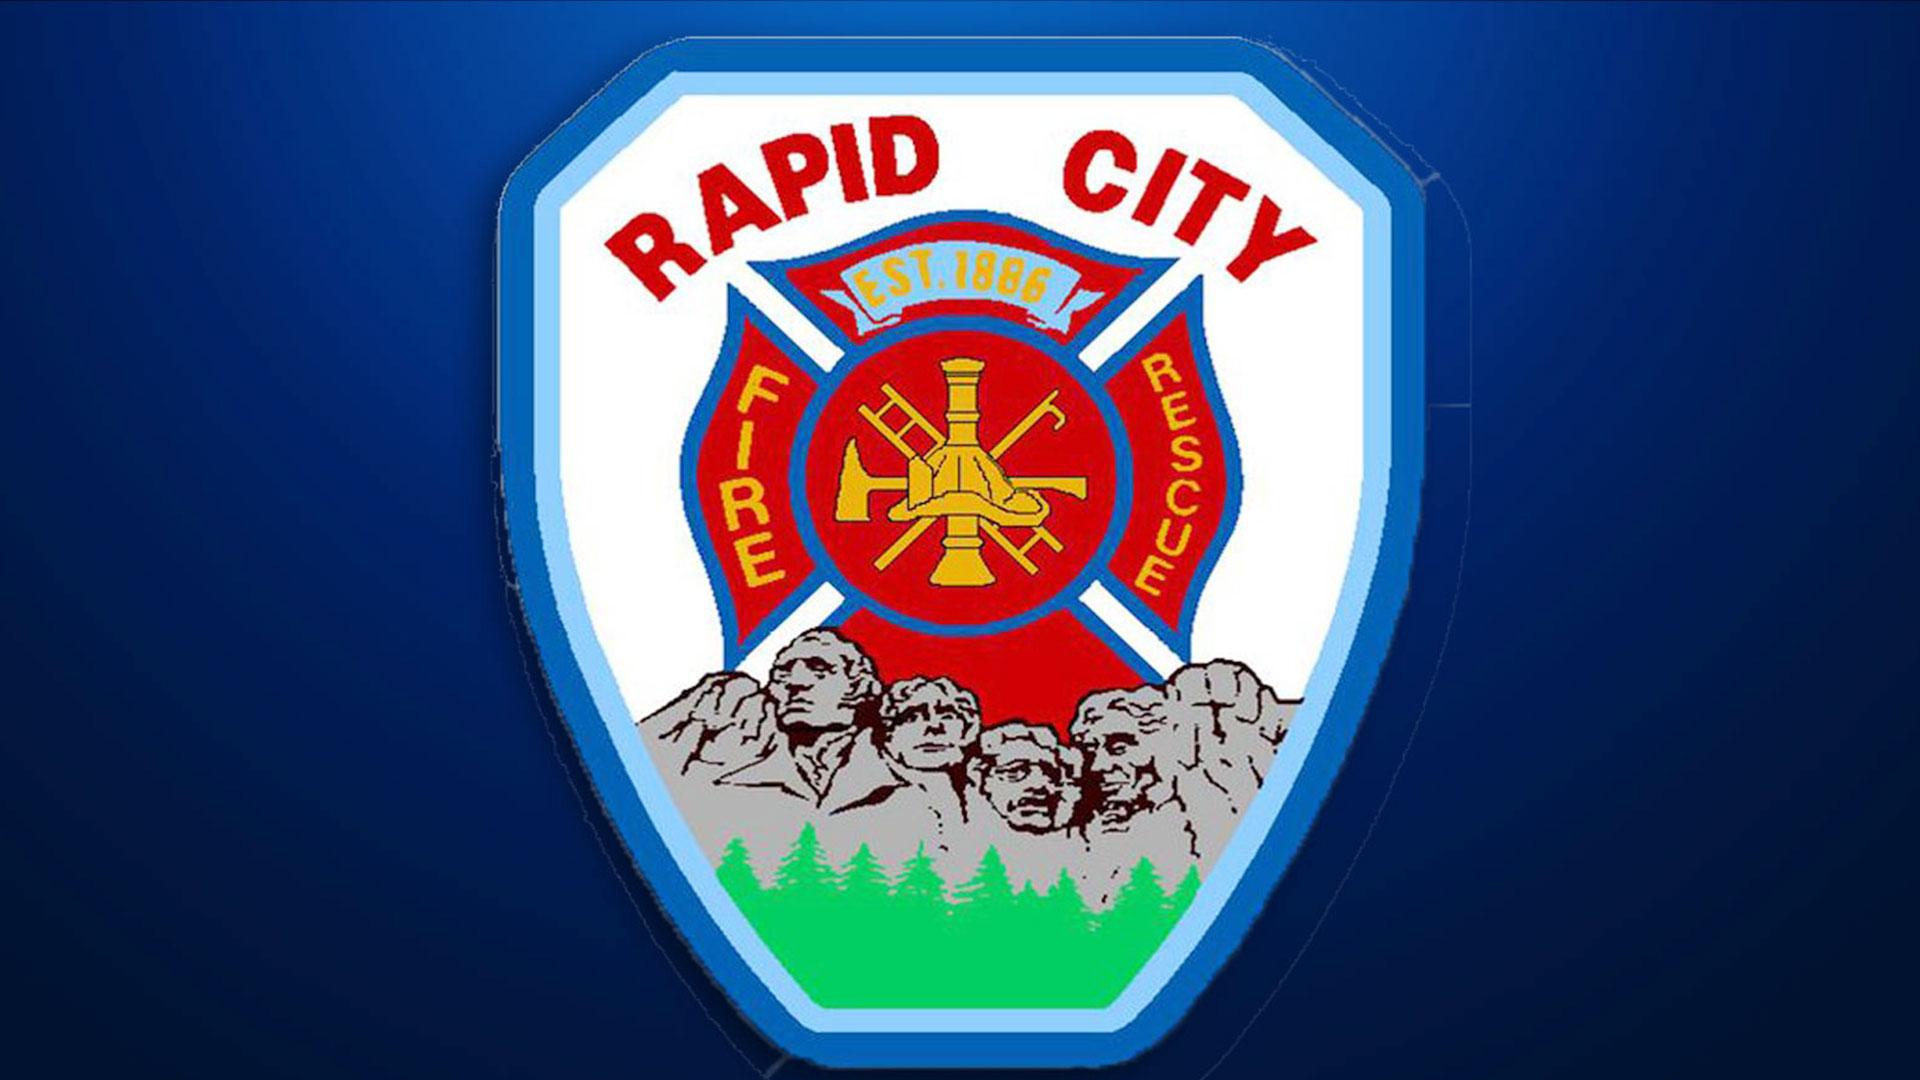 KELO Rapid City Fire Department